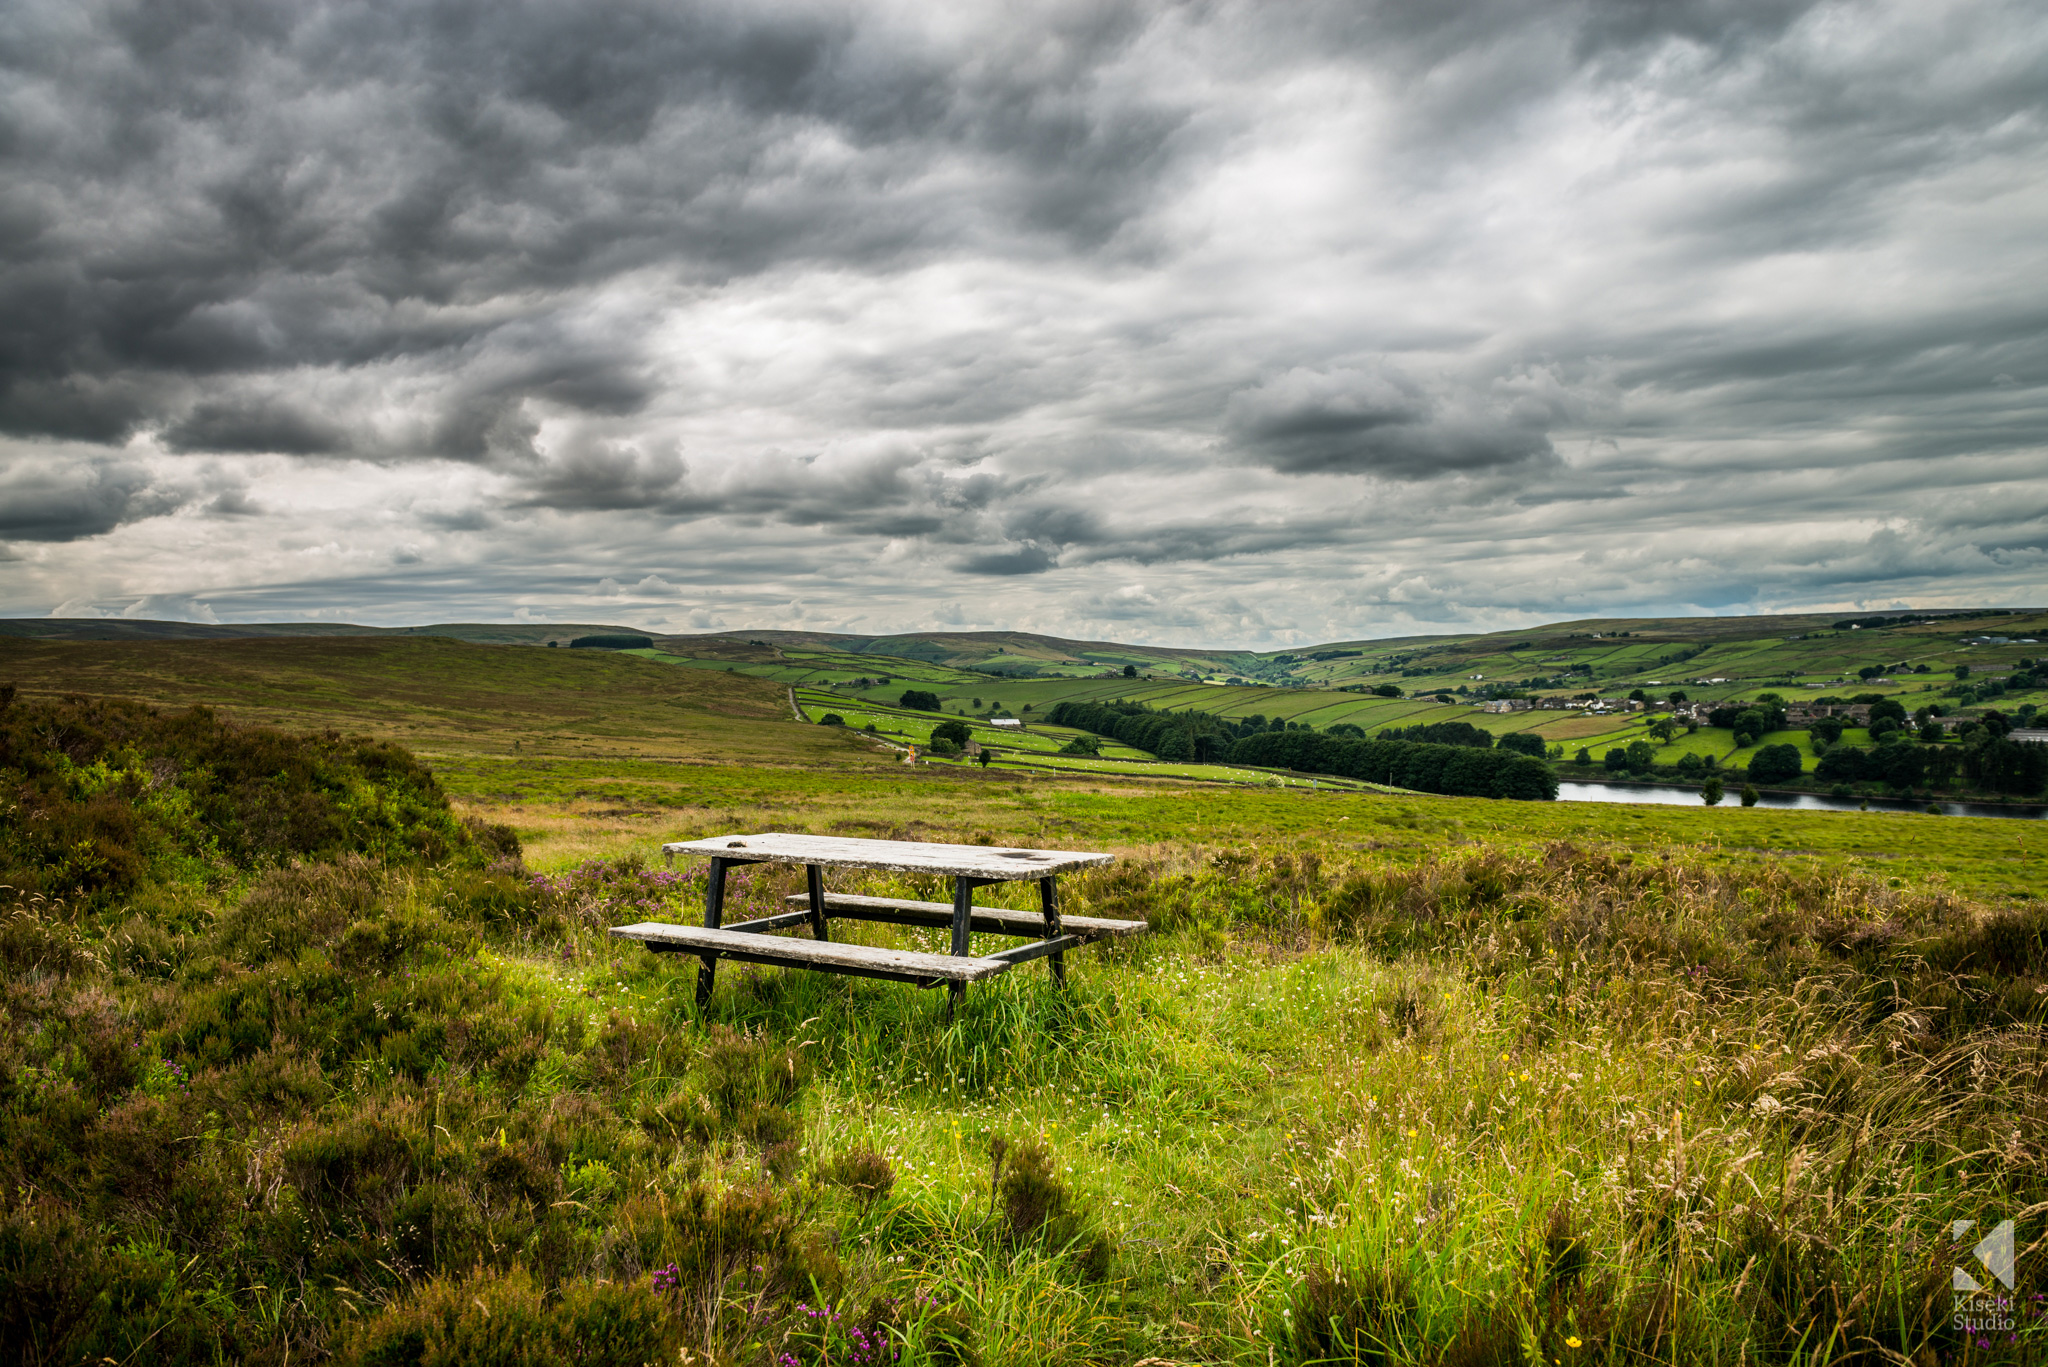 Bronte Way Bench Landscape